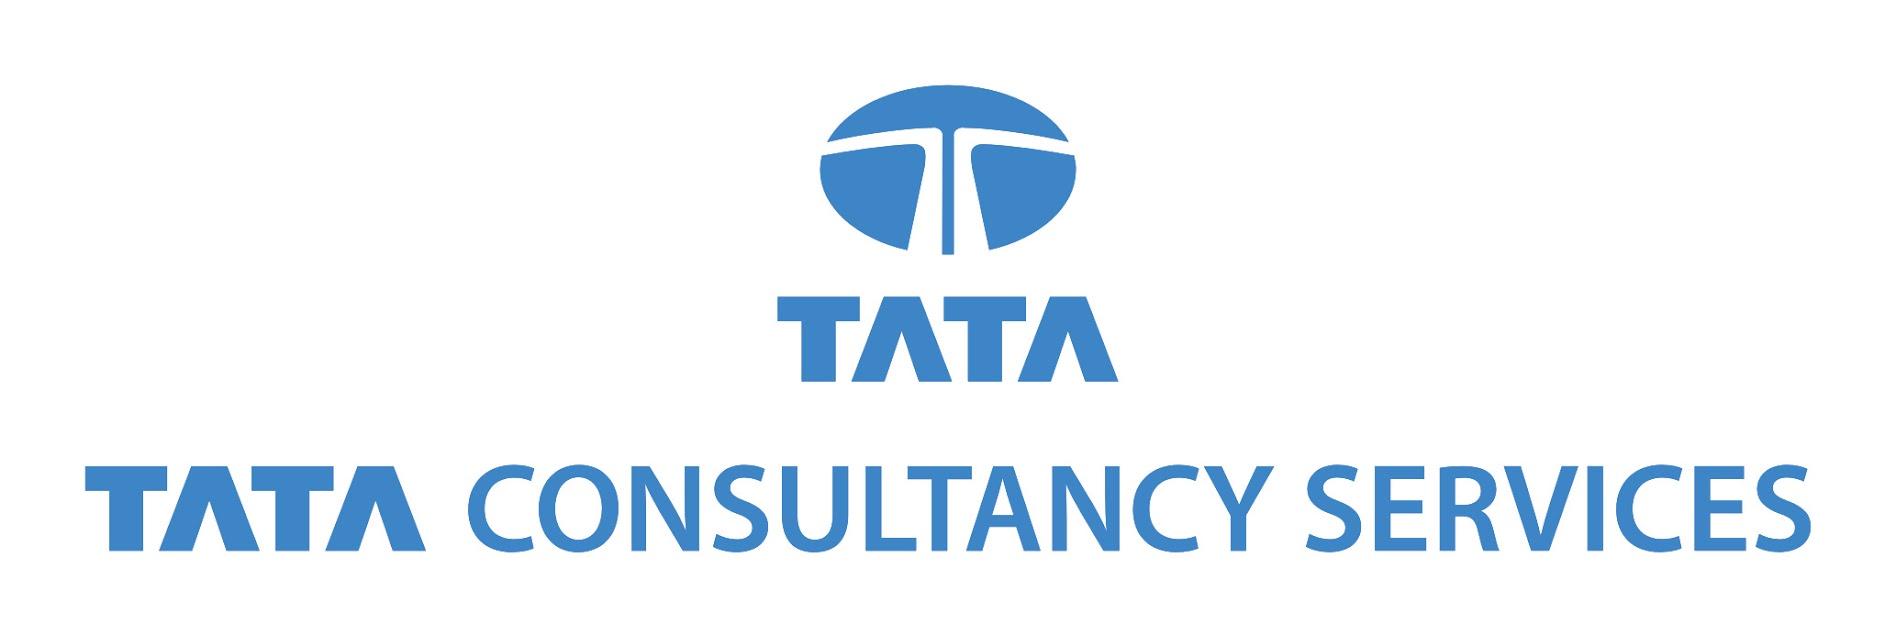 Tata and TCS Marks